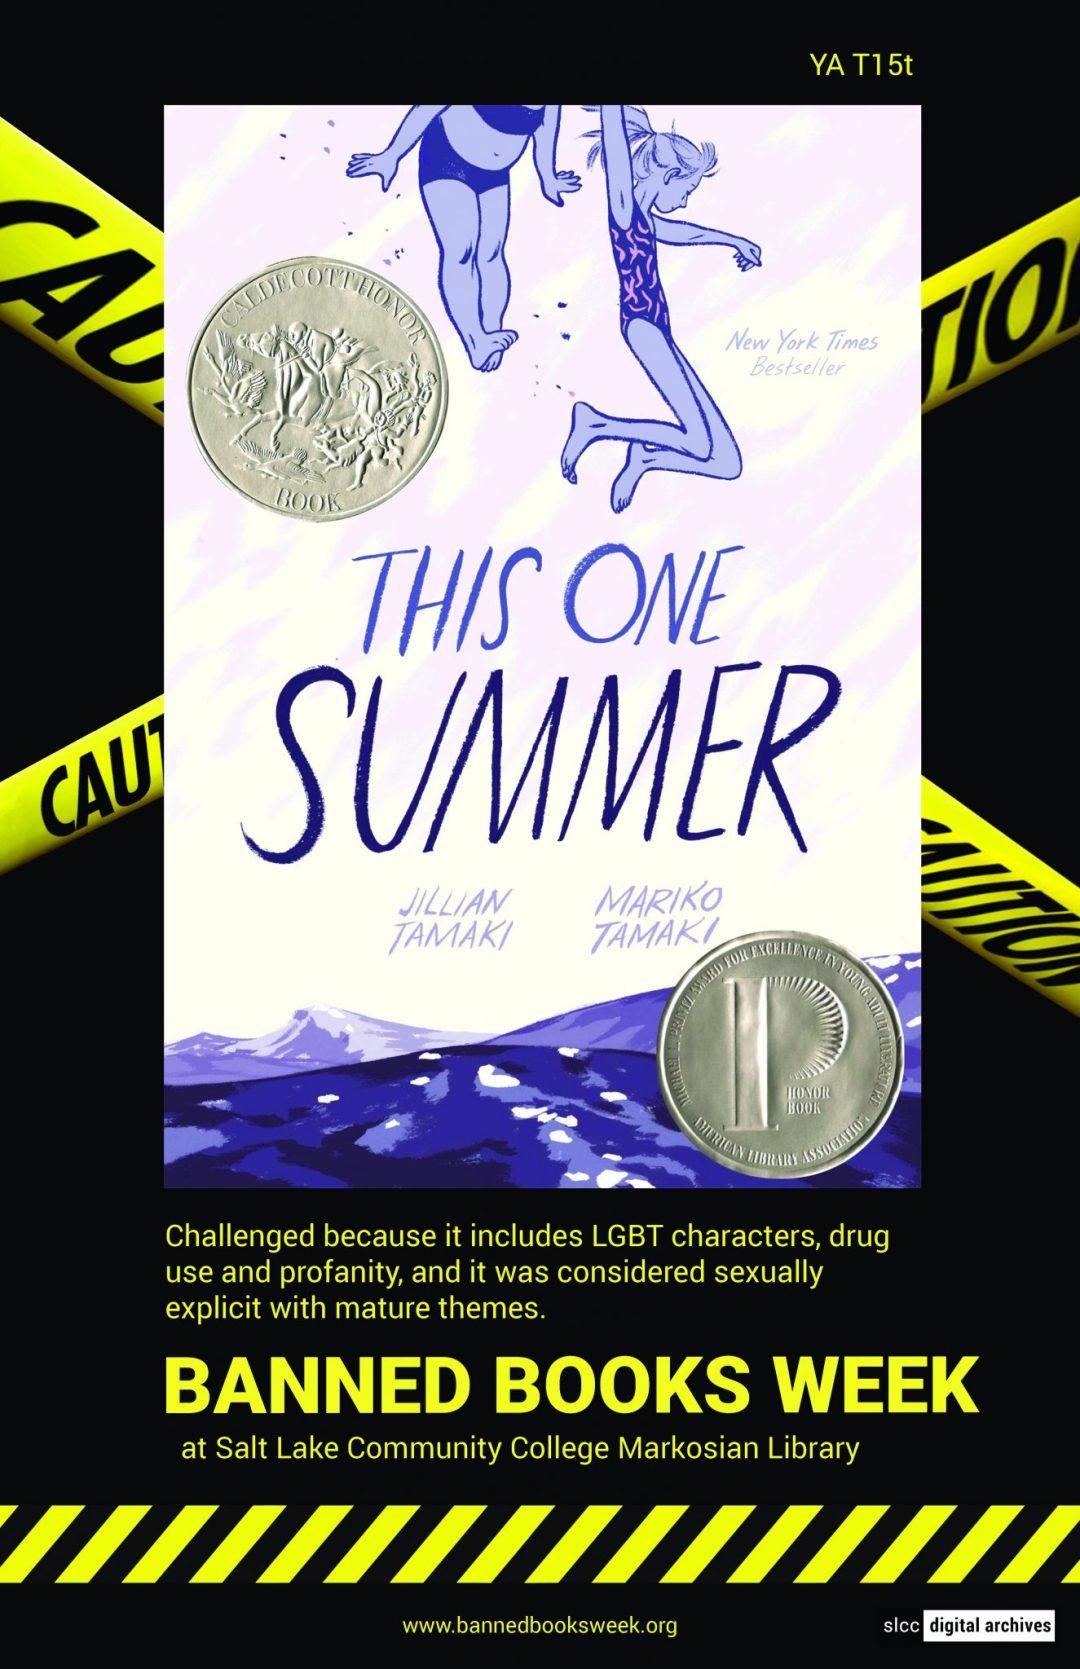 Banned Books Week Poster: This One Summer by Jillin Tamaki and Mariko Tamaki